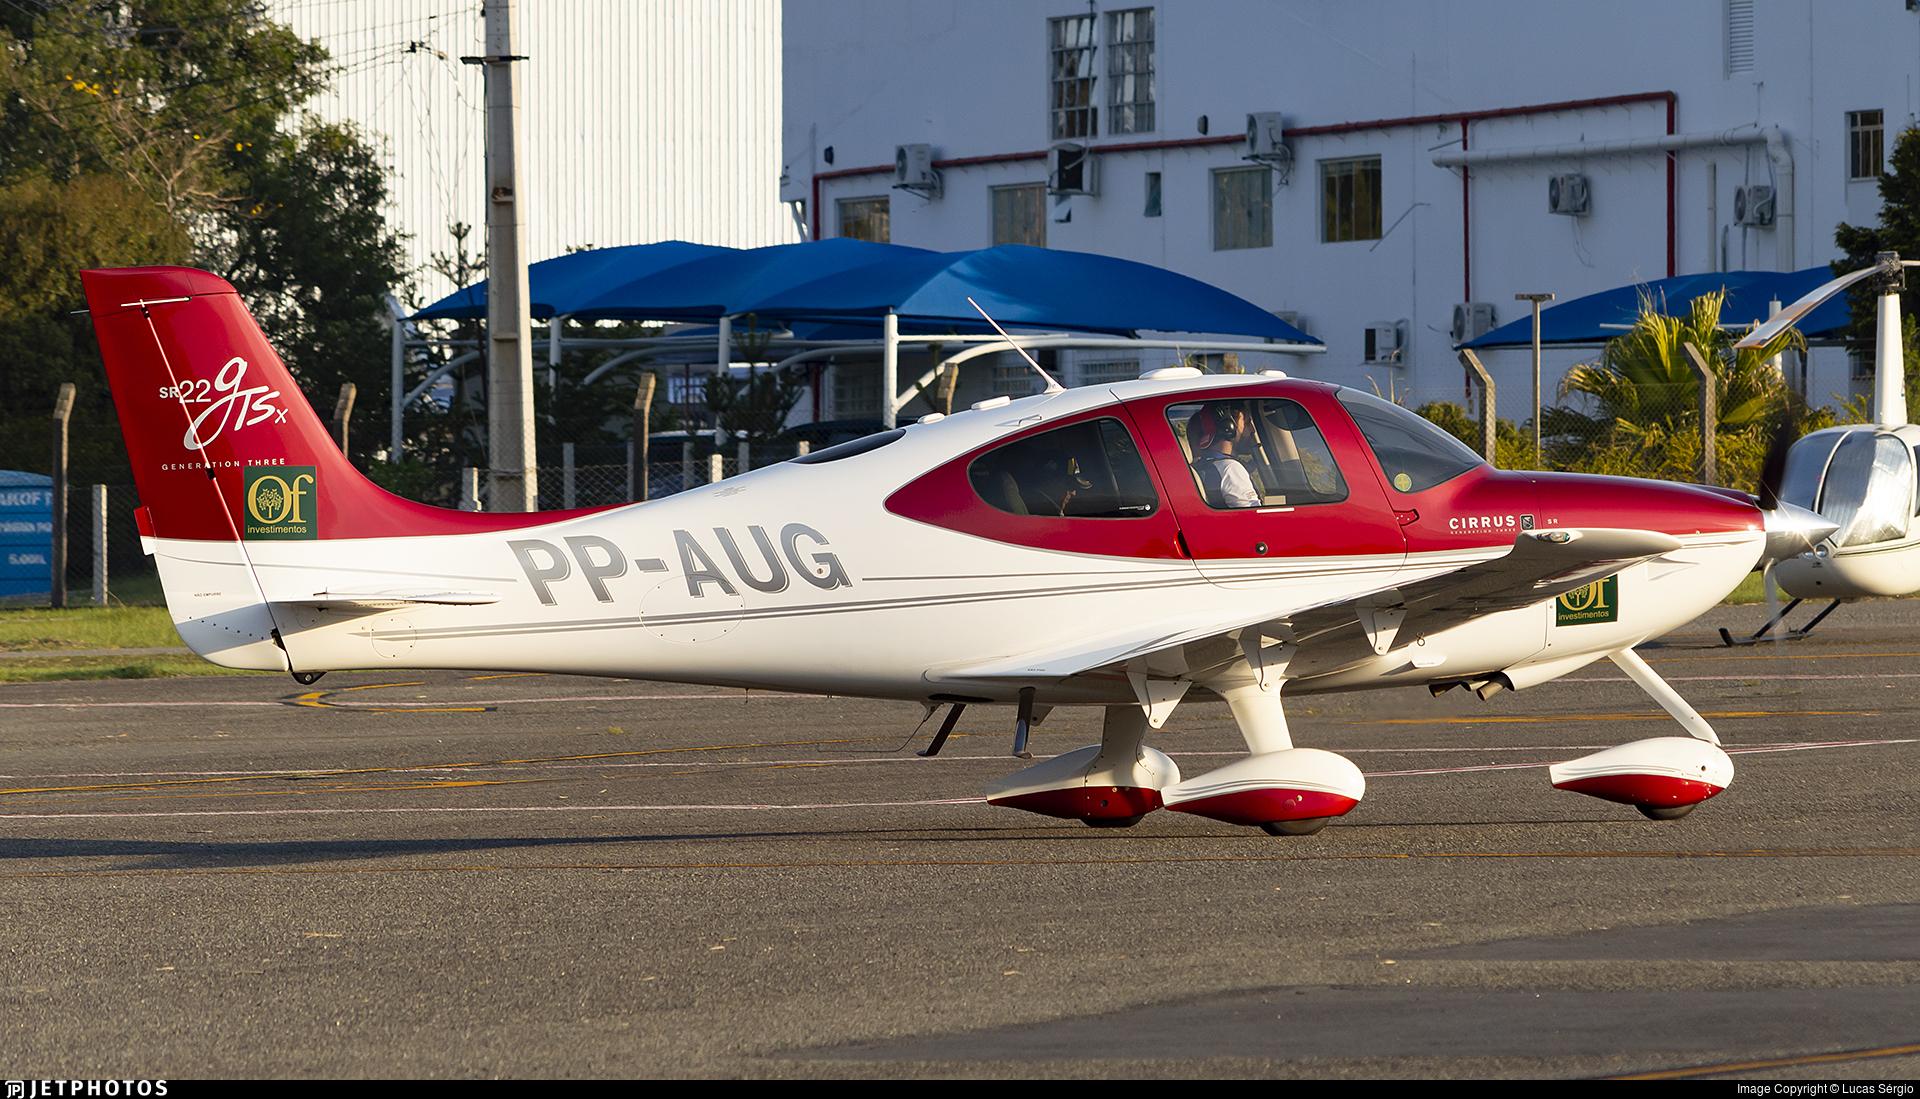 PP-AUG - Cirrus SR22-GTS - Private